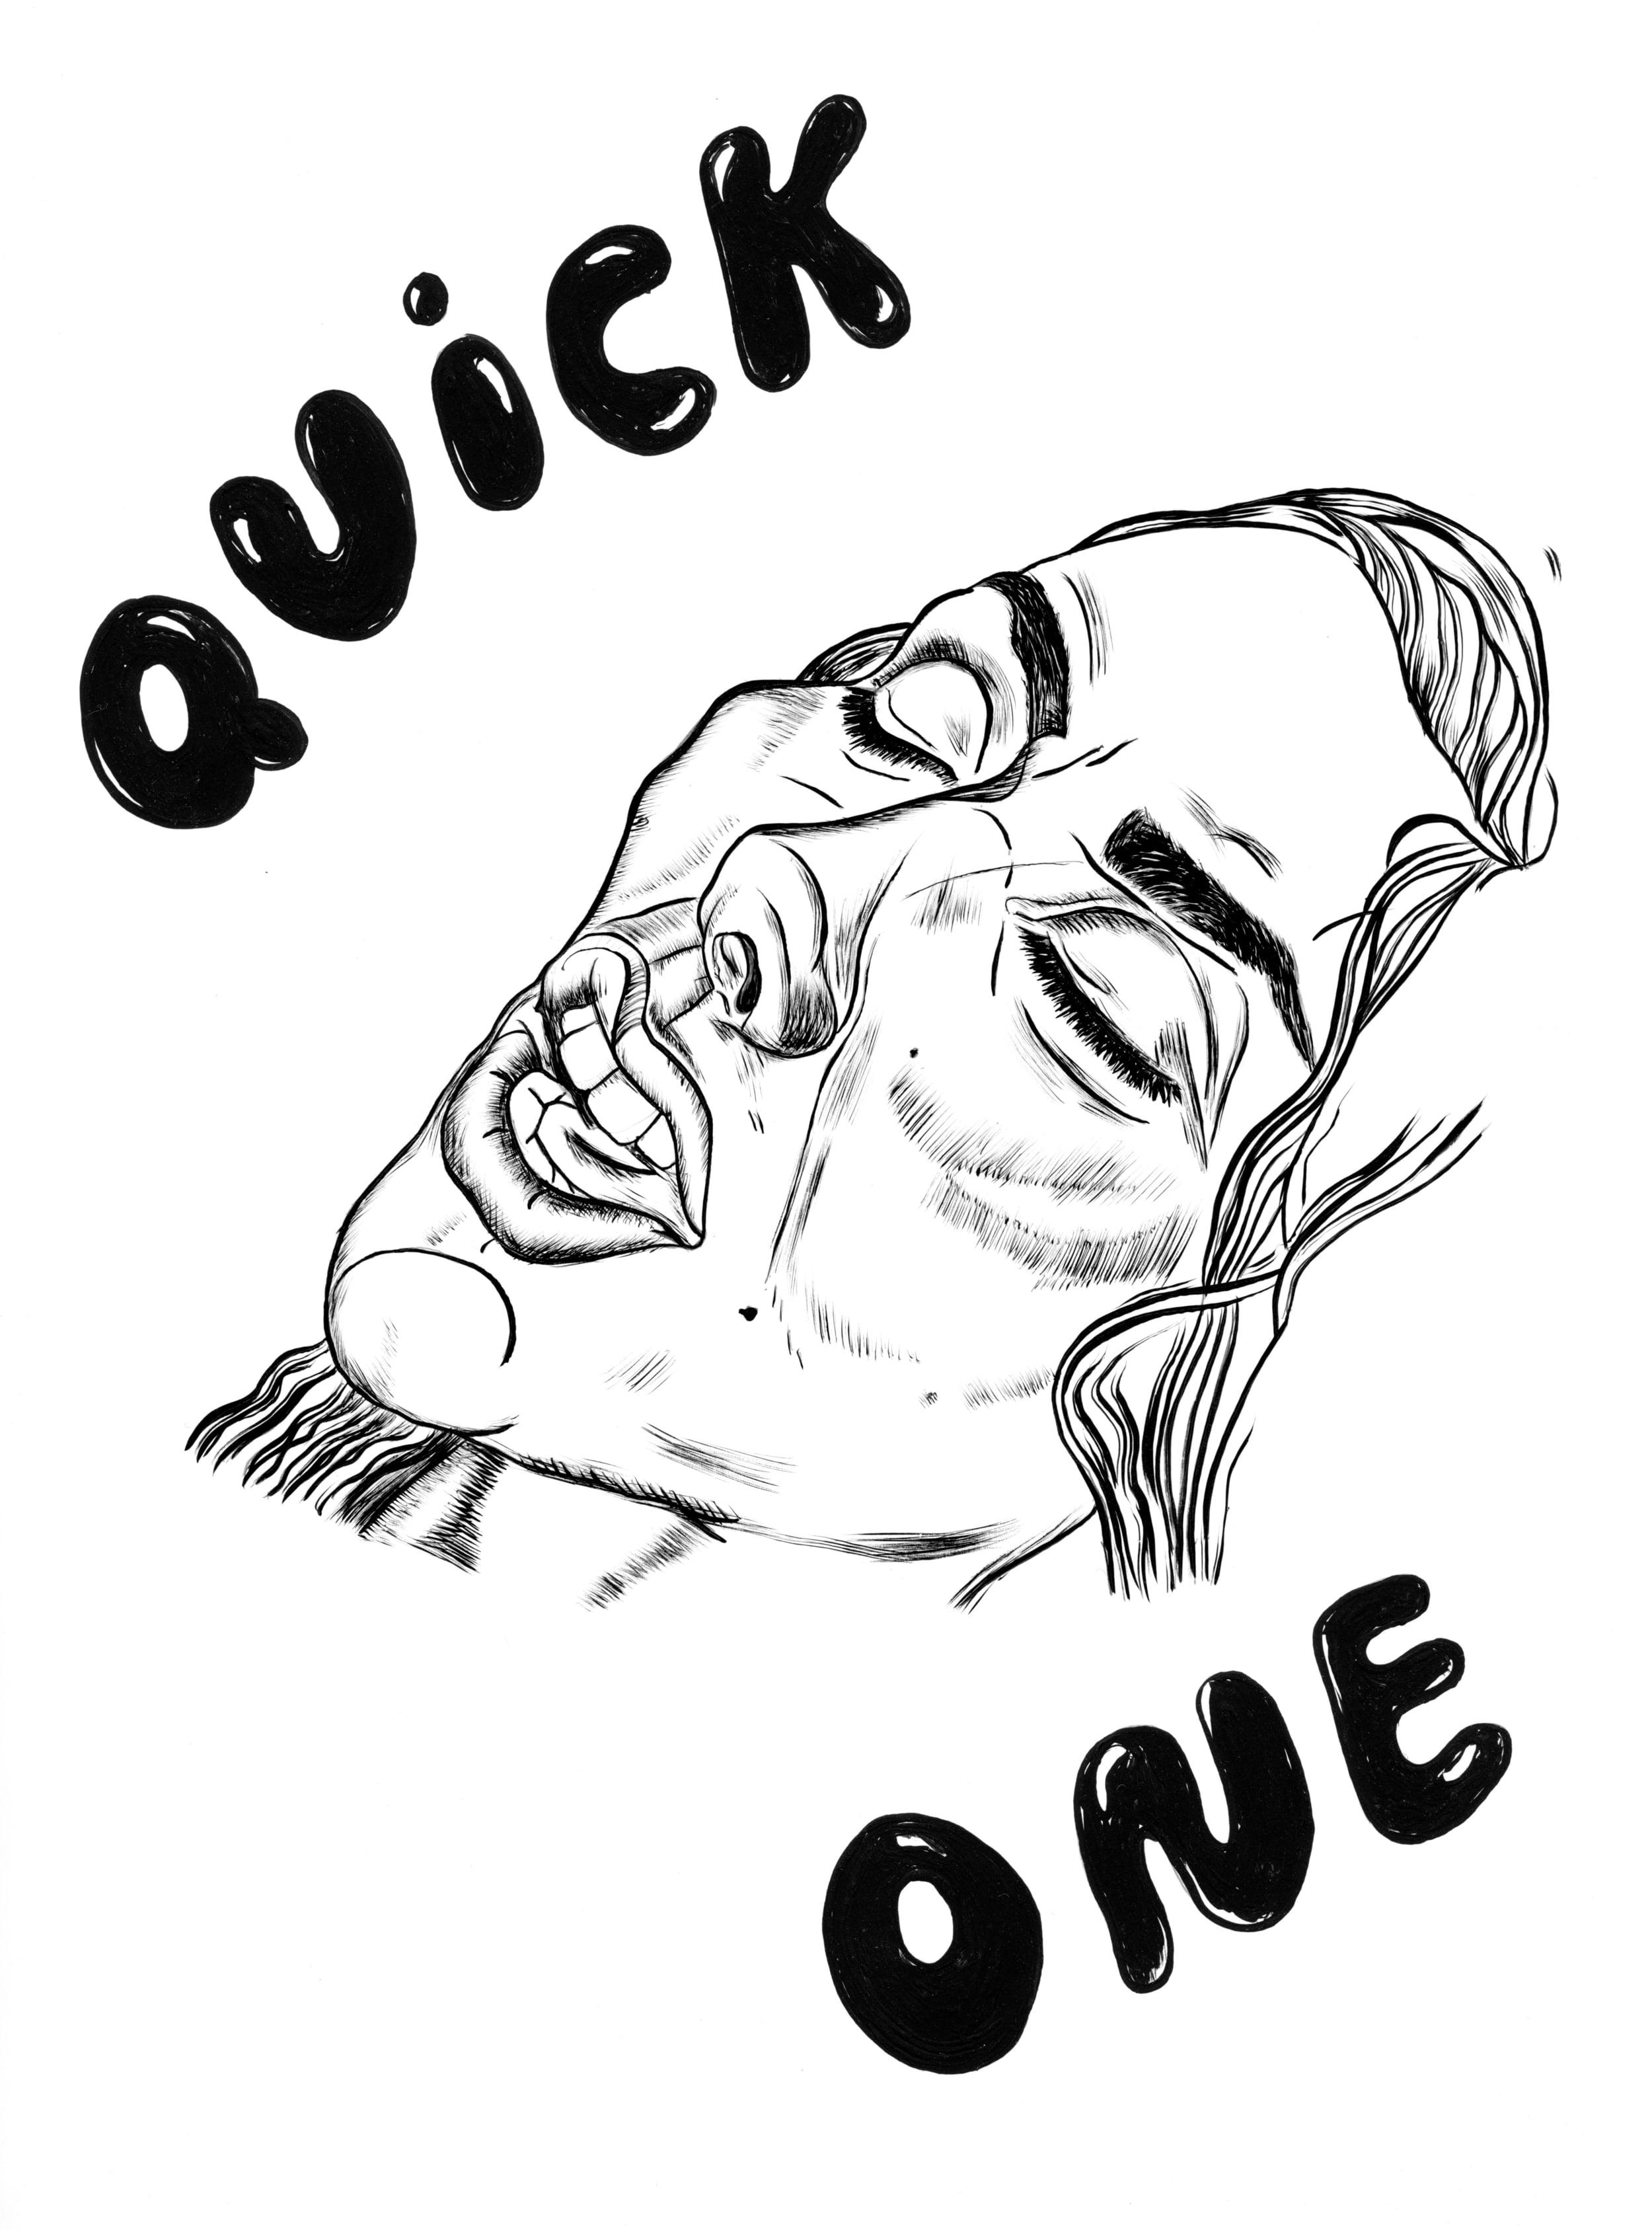 Quickone.jpg